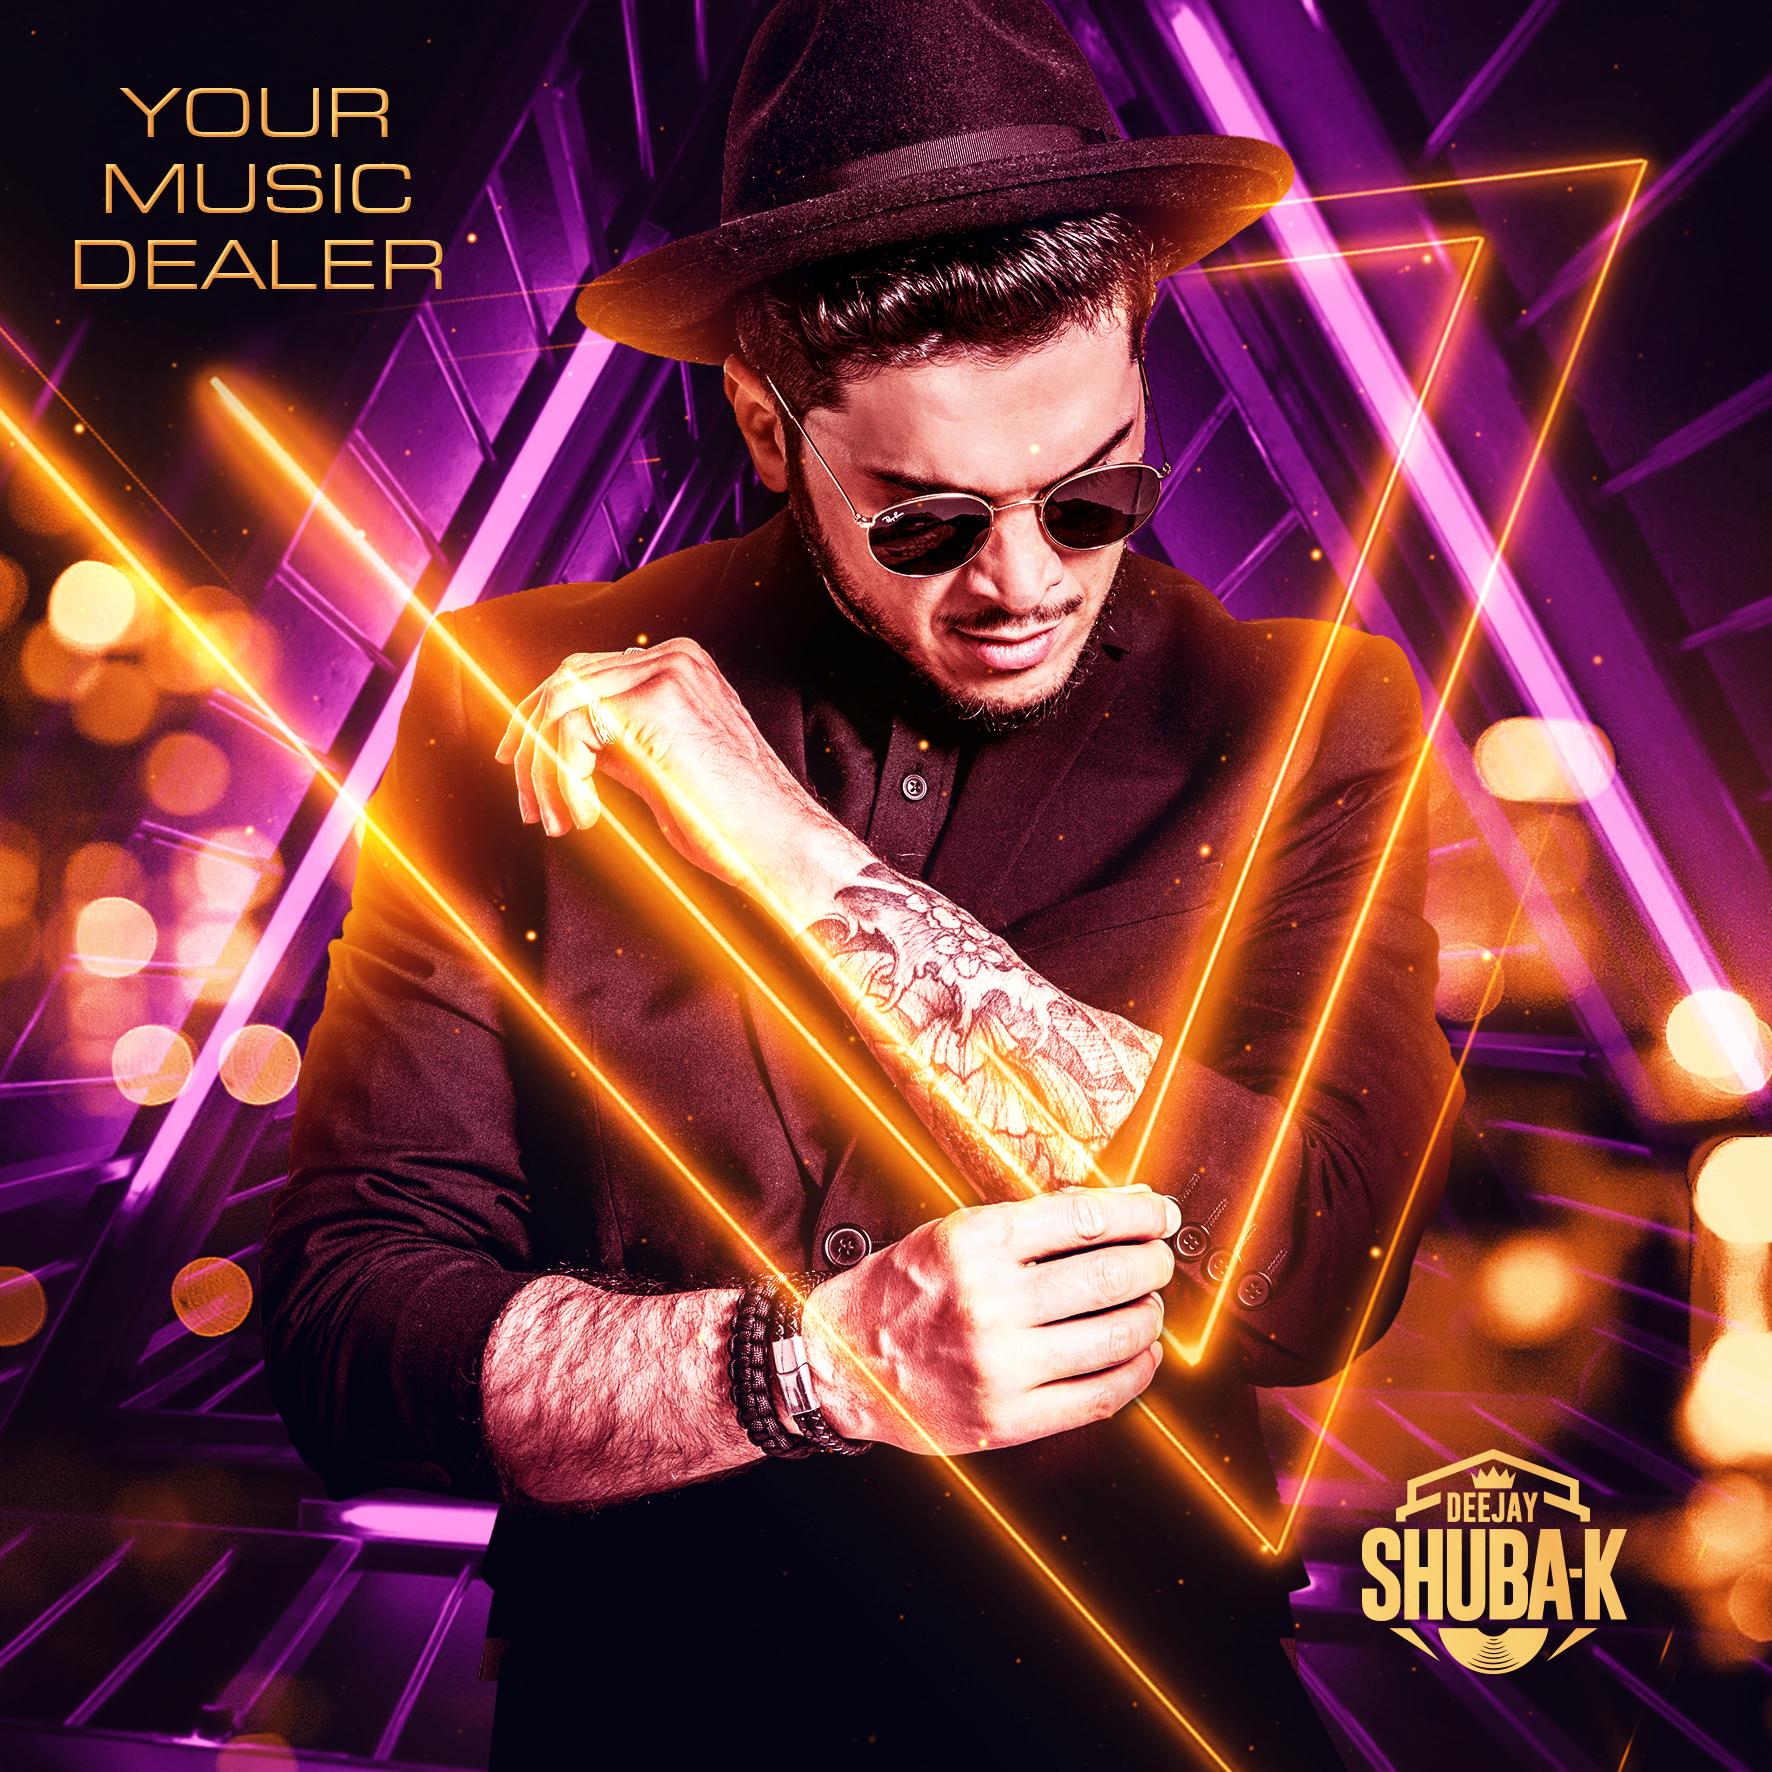 Dj Shuba-K // YOUR MUSIC DEALER  Image